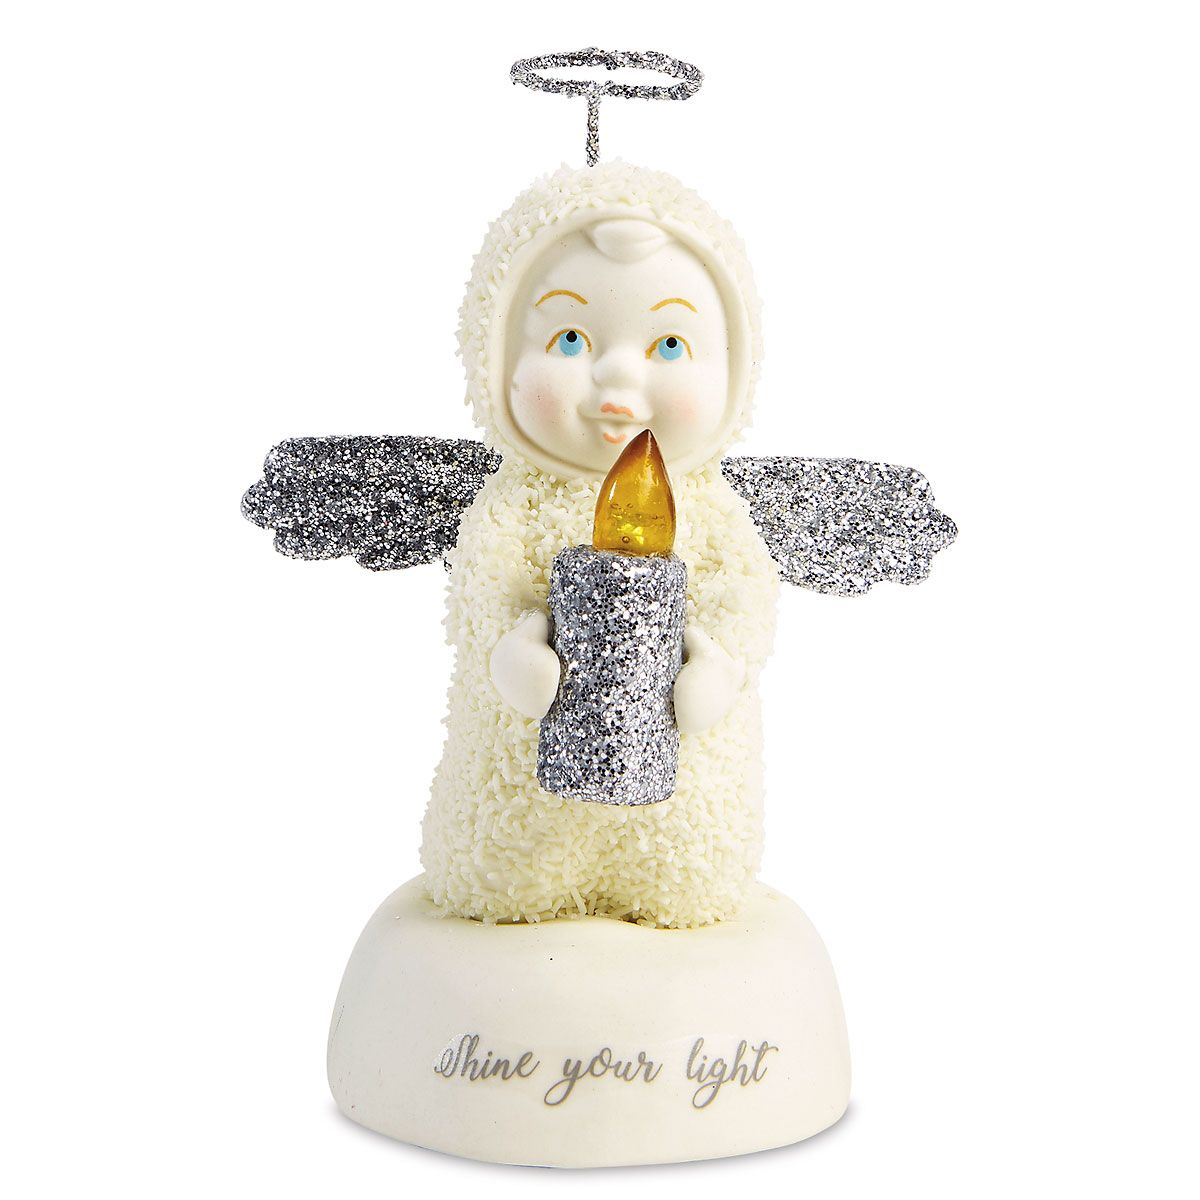 Snowbabies™ Shine Your Light Figurine